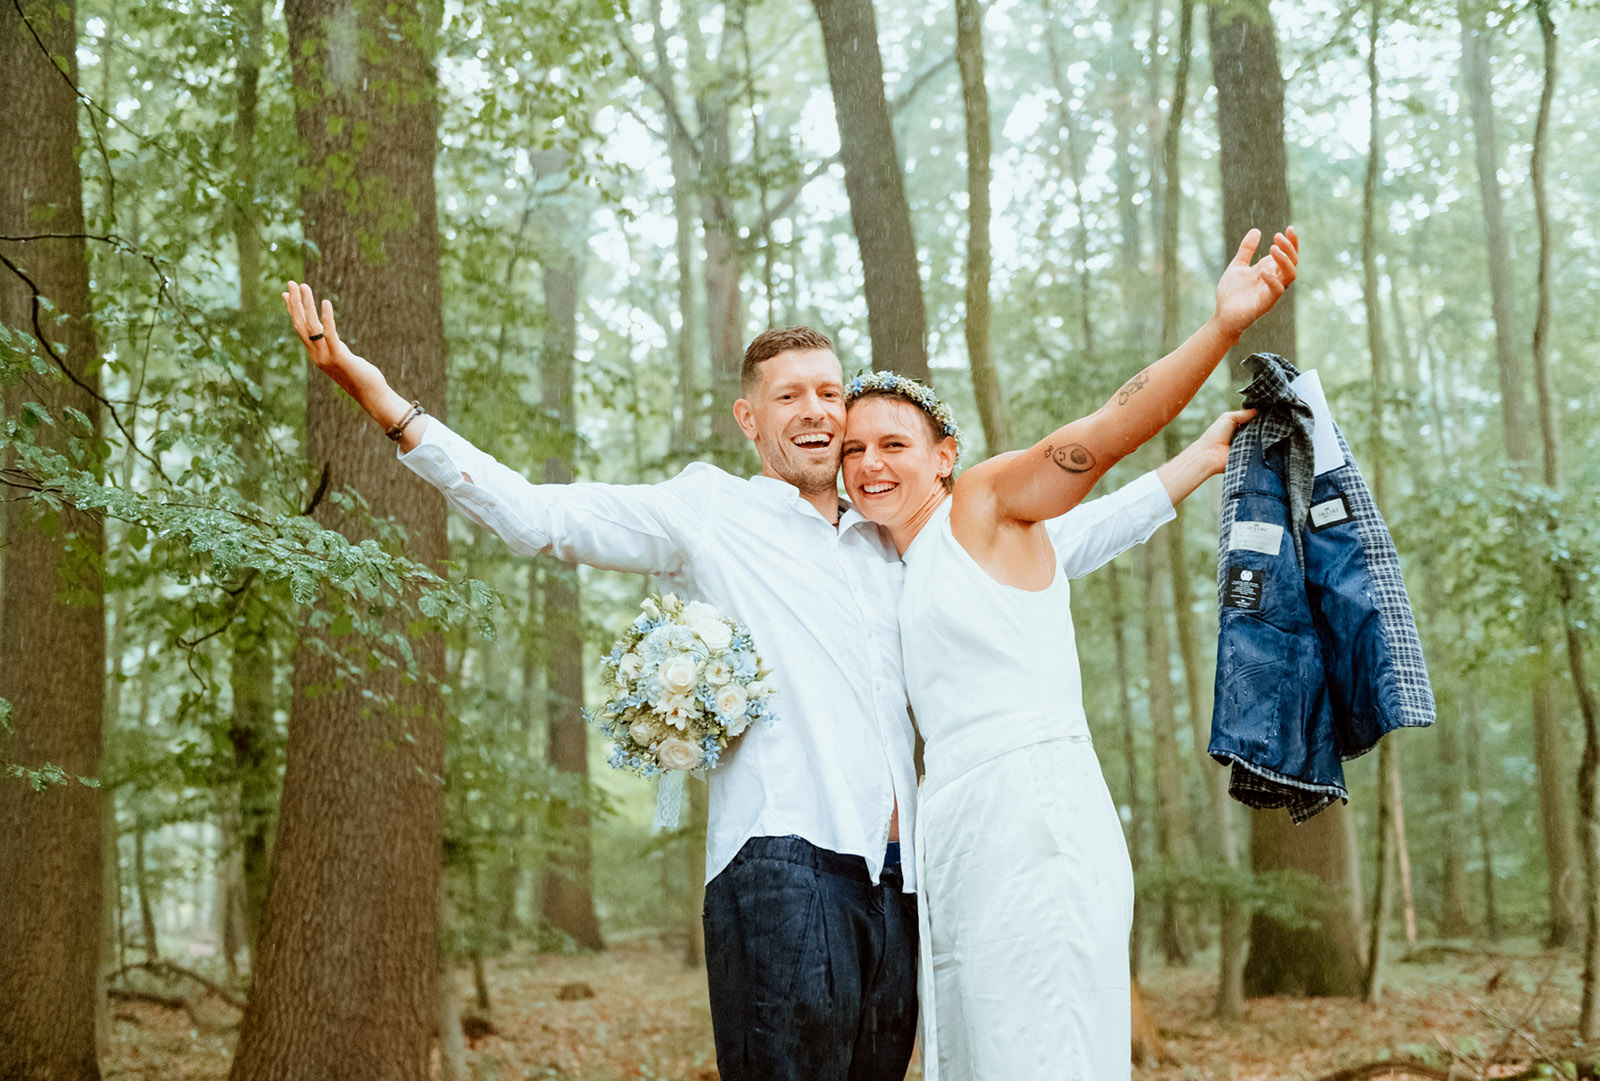 Hochzeitsshooting bei Regen im Dortmunder Rombergpark